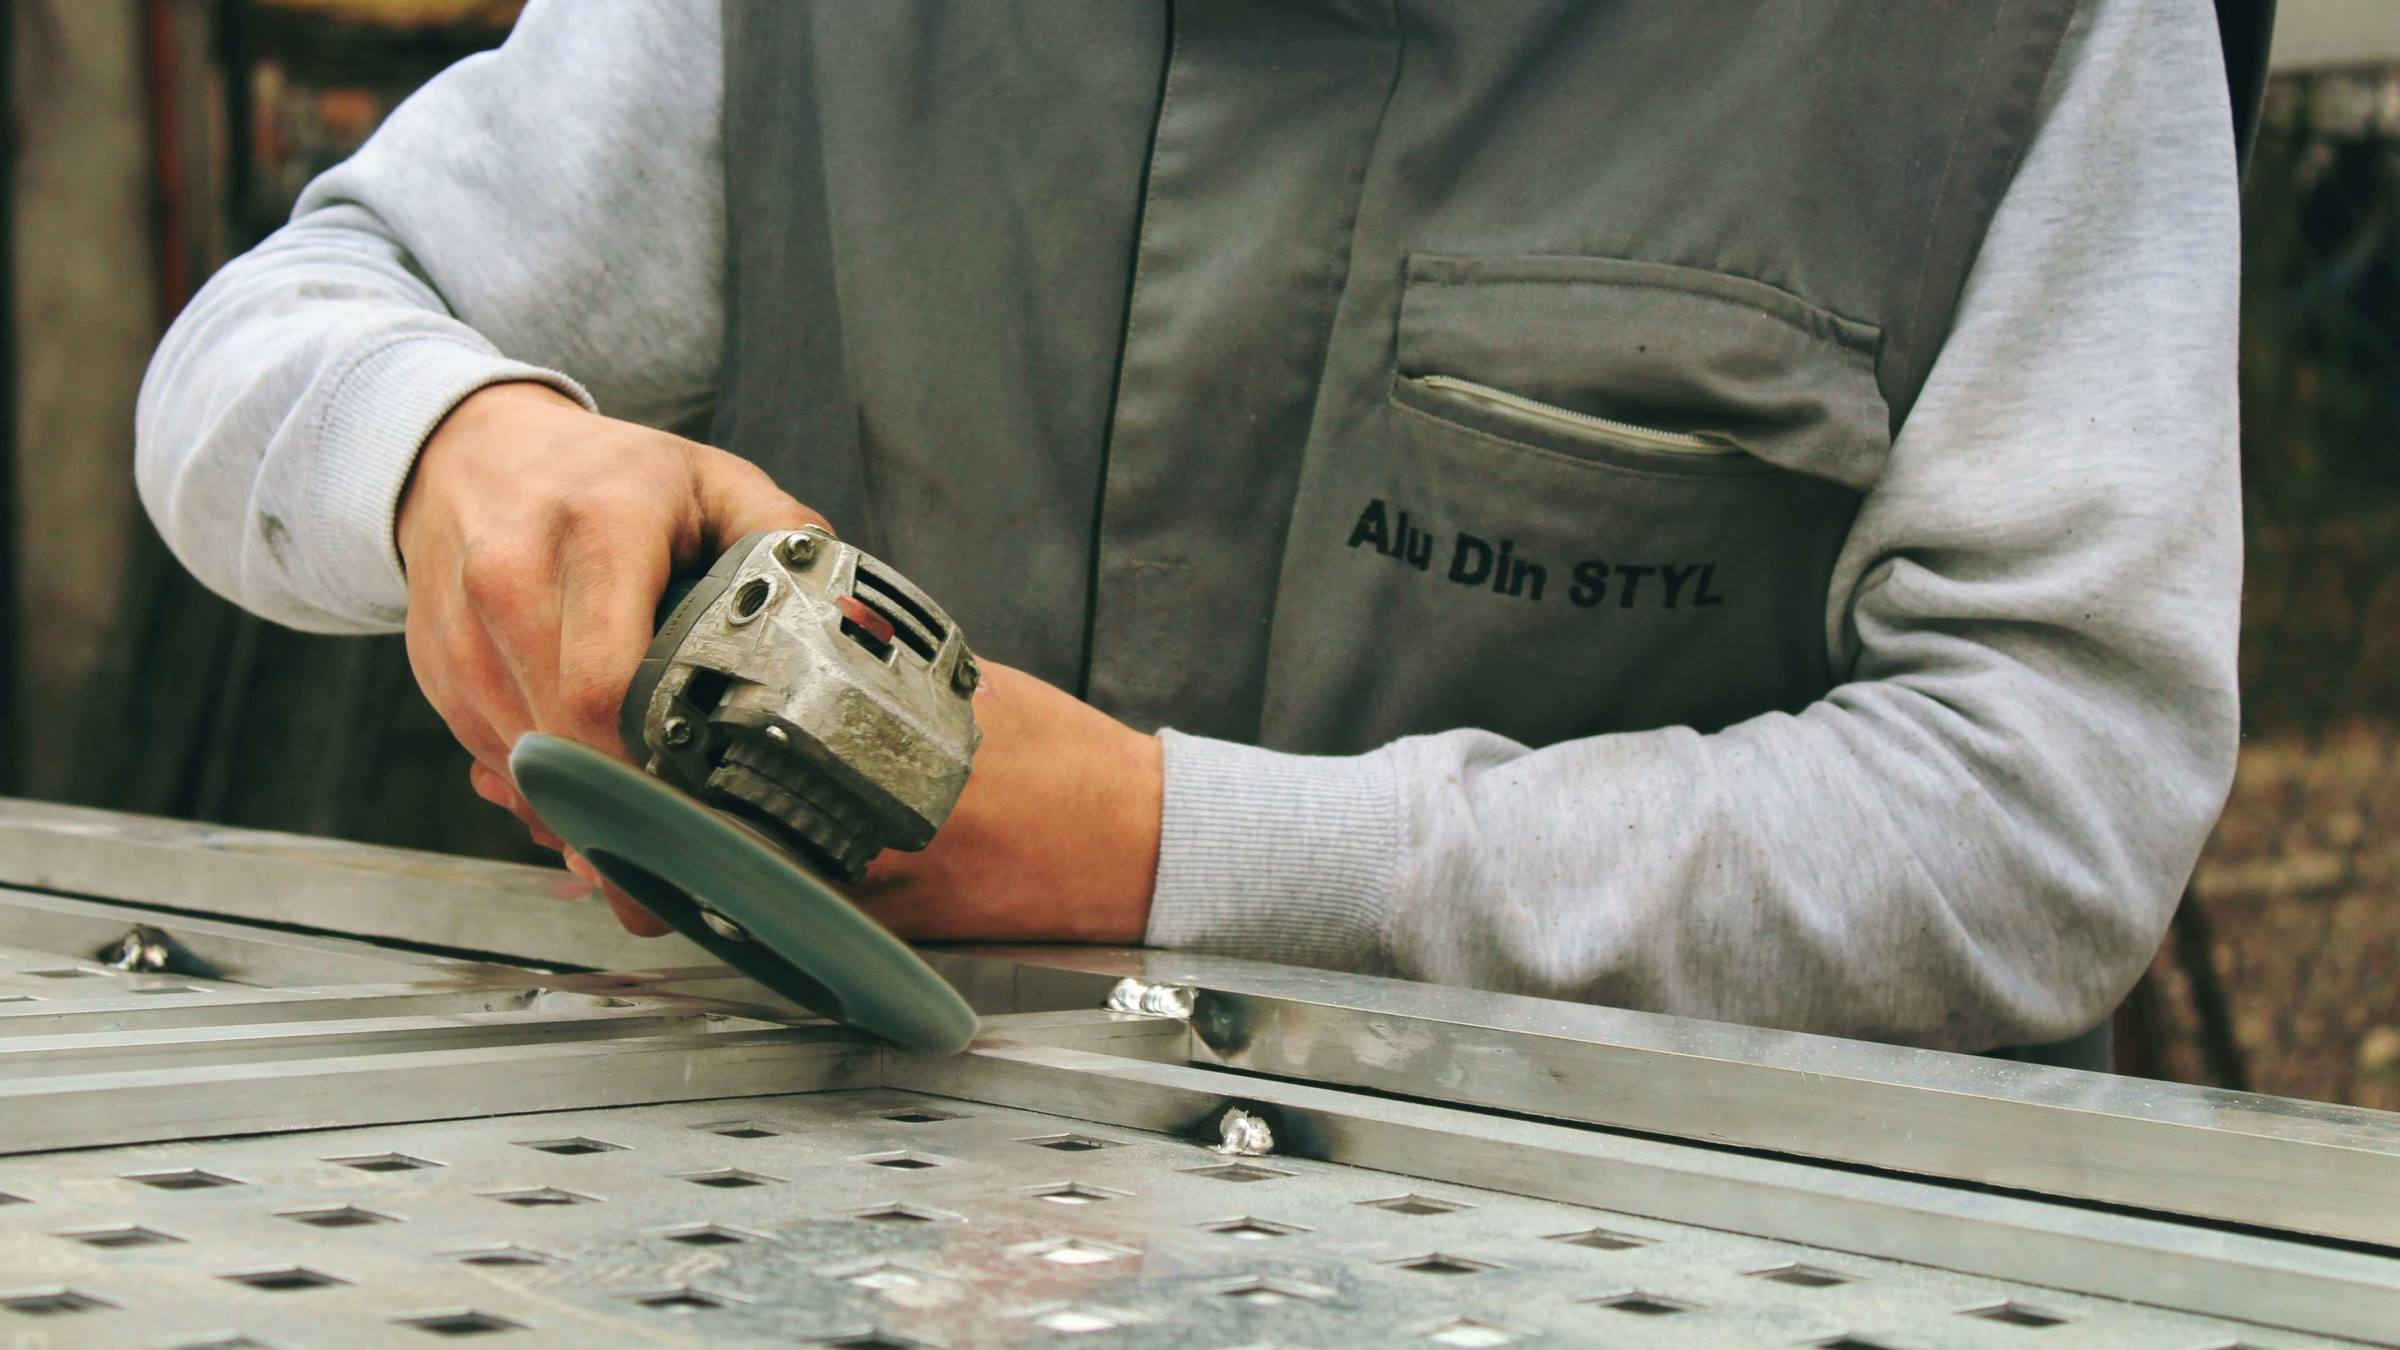 Worker grinder sheet metal